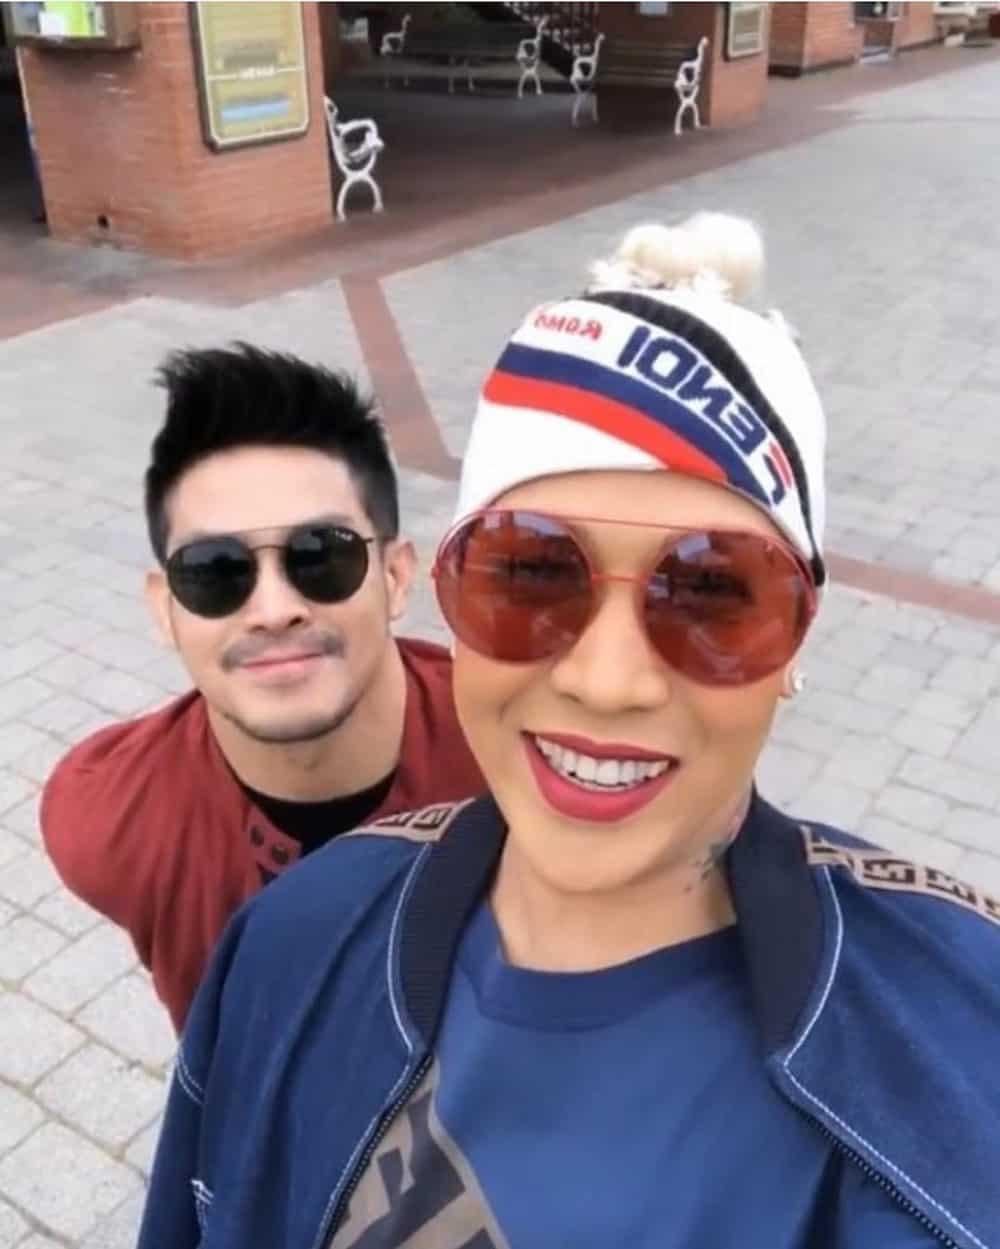 Vice Ganda and Ion